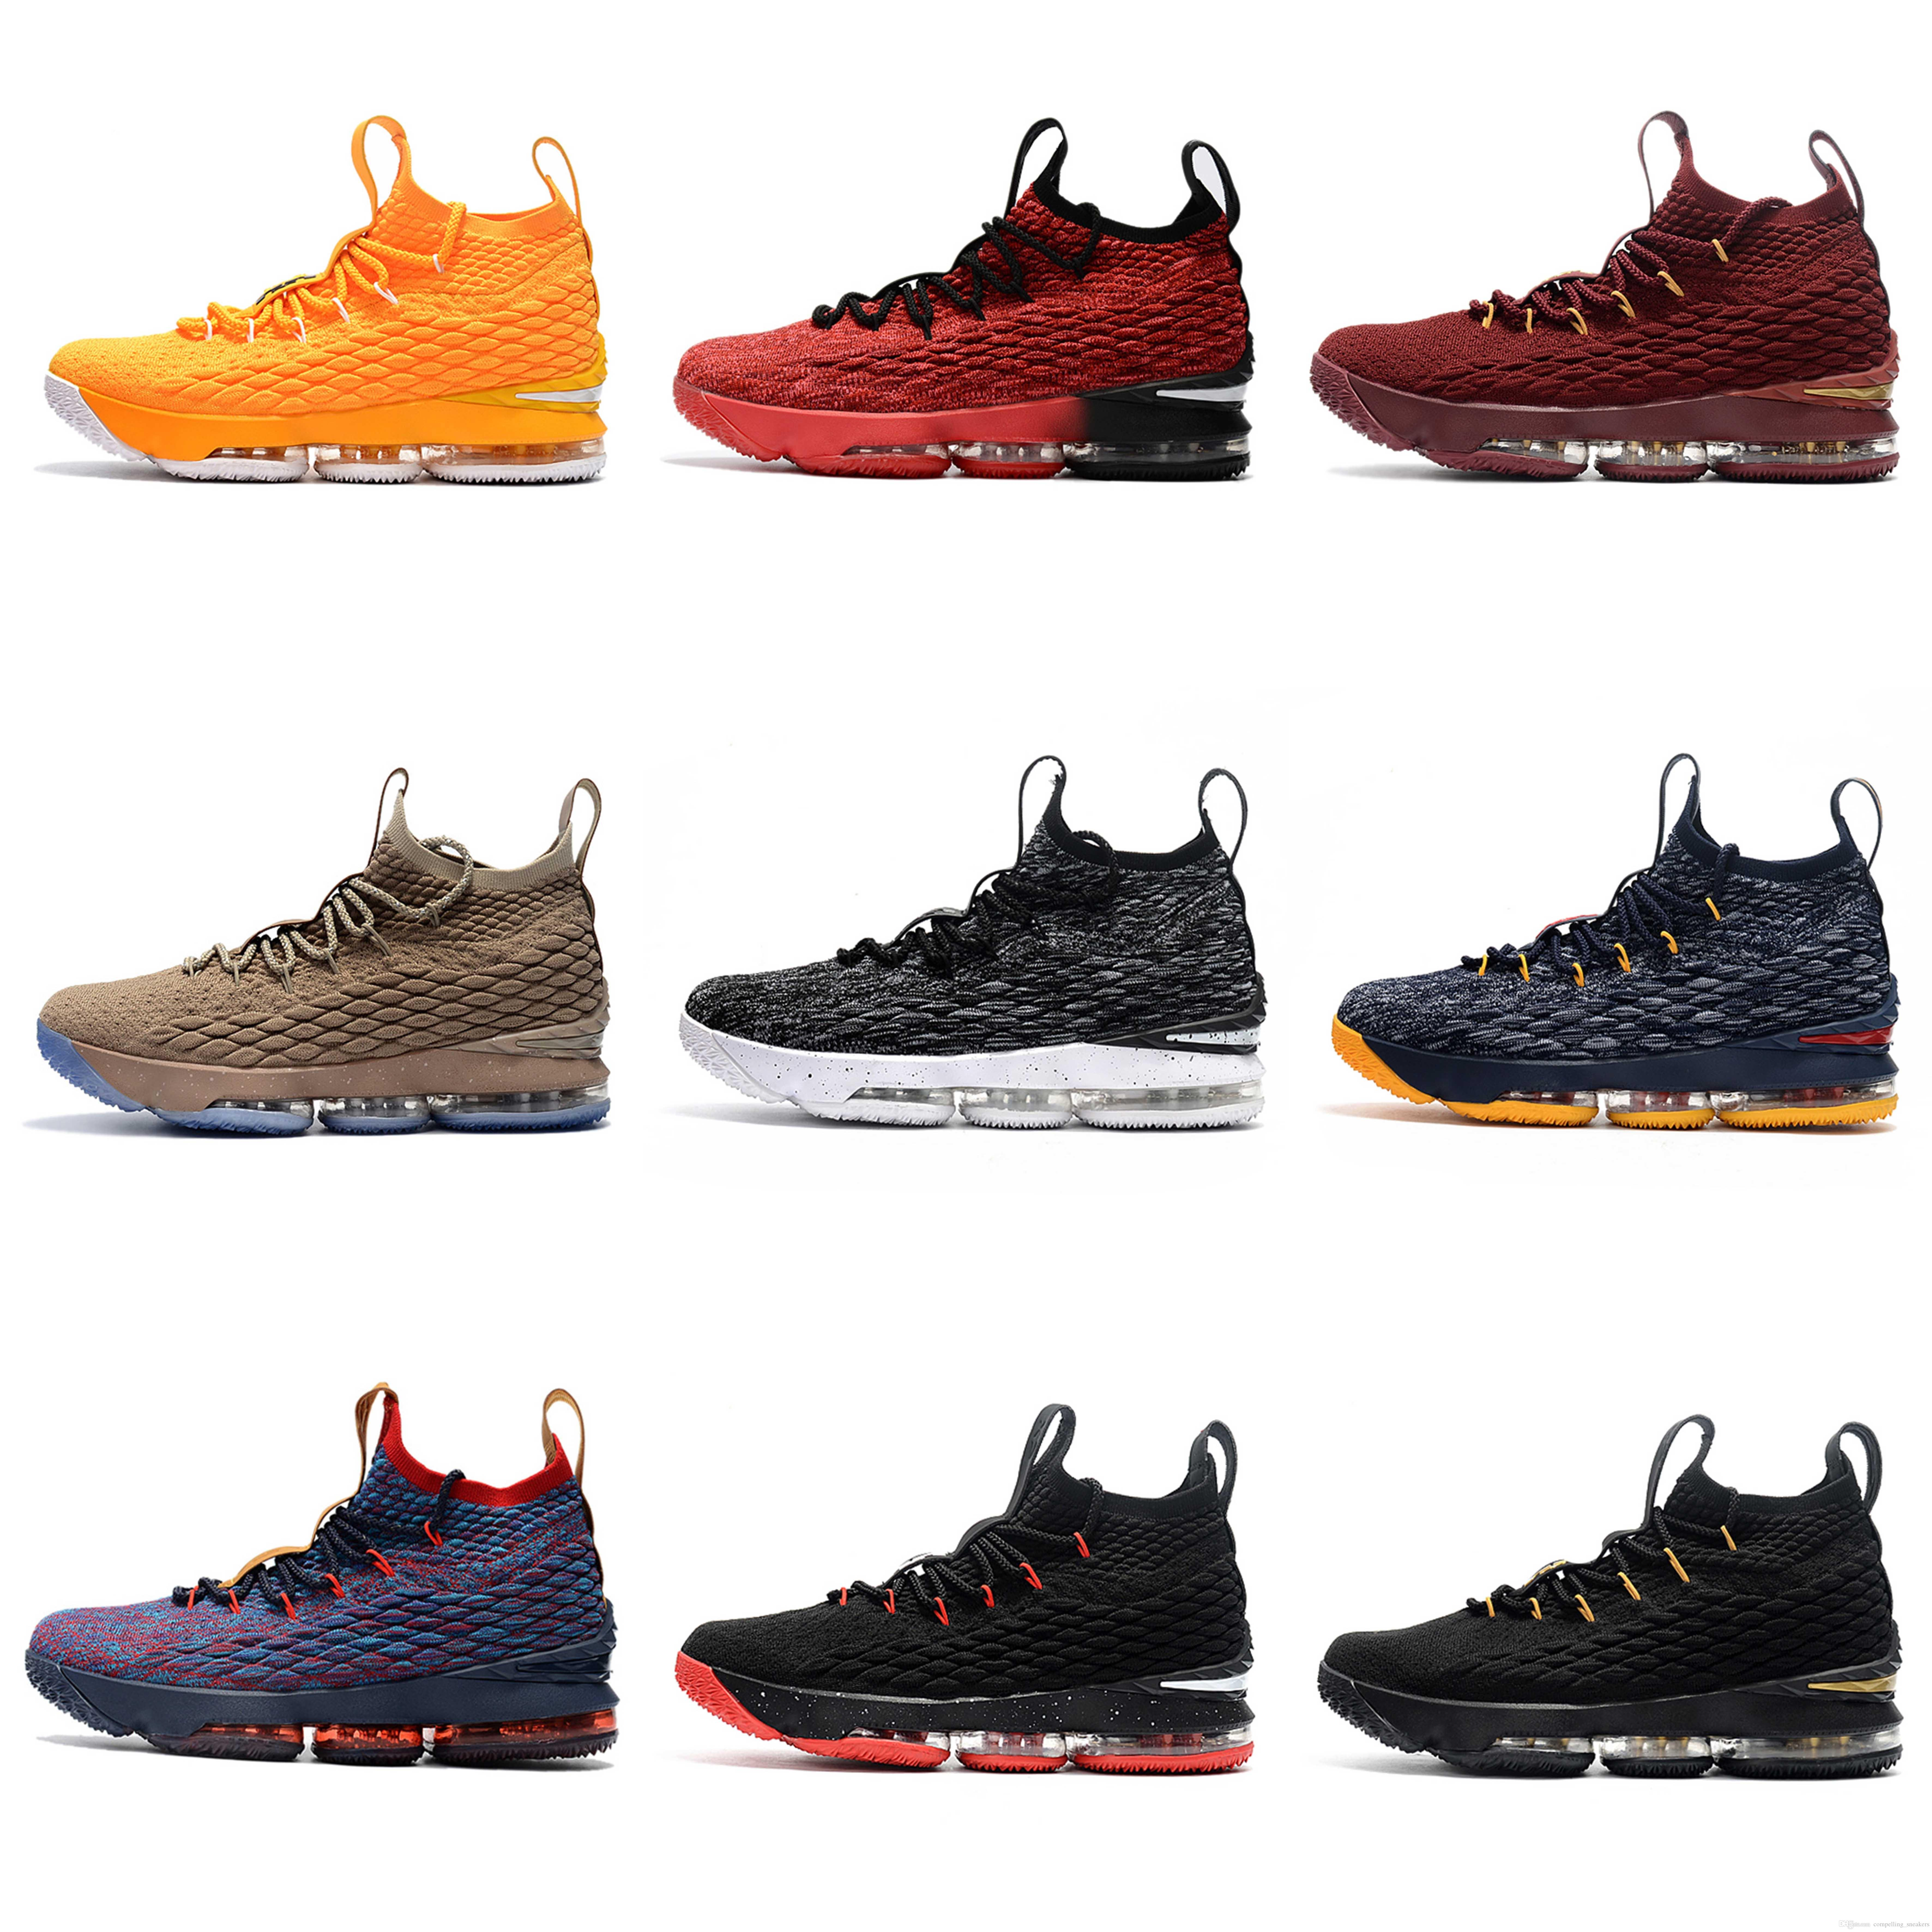 2019 2019 Classic Top Quality 15 XV 15TH Women Basketball Shoes ... 3b32256a5